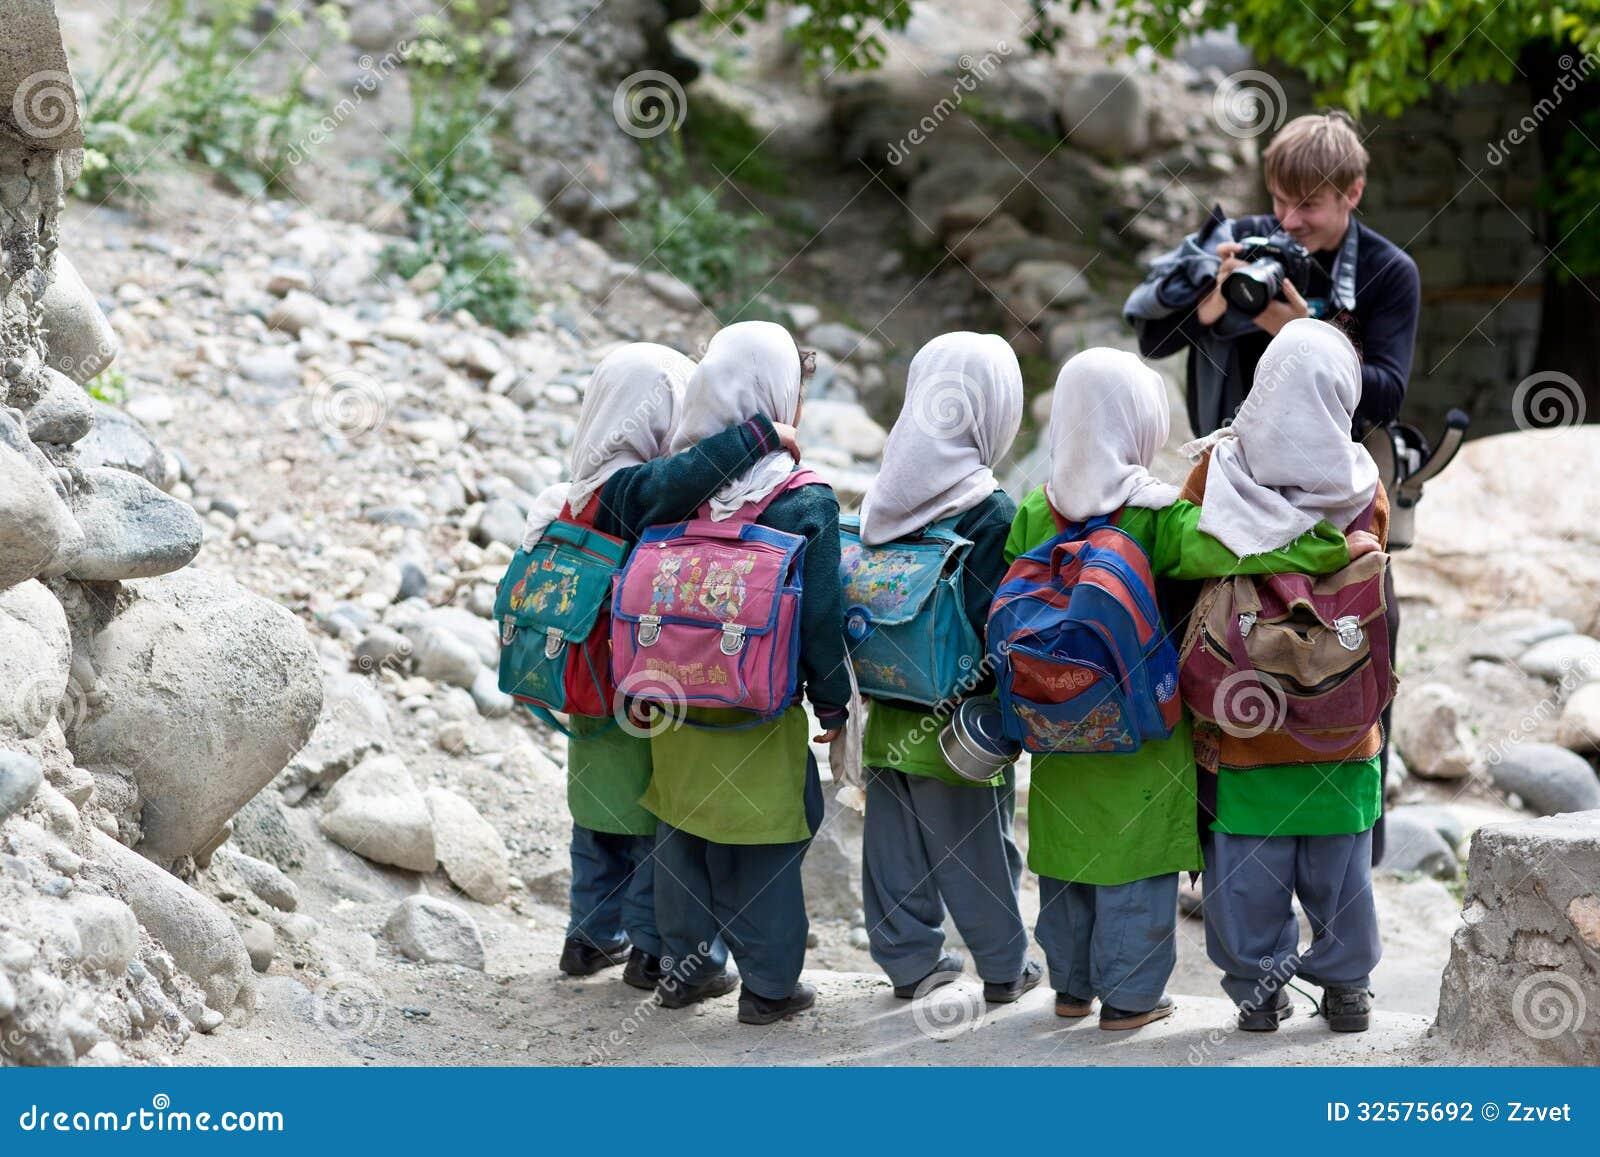 Balti Girls In Ladakh, India Editorial Photography - Image -6730